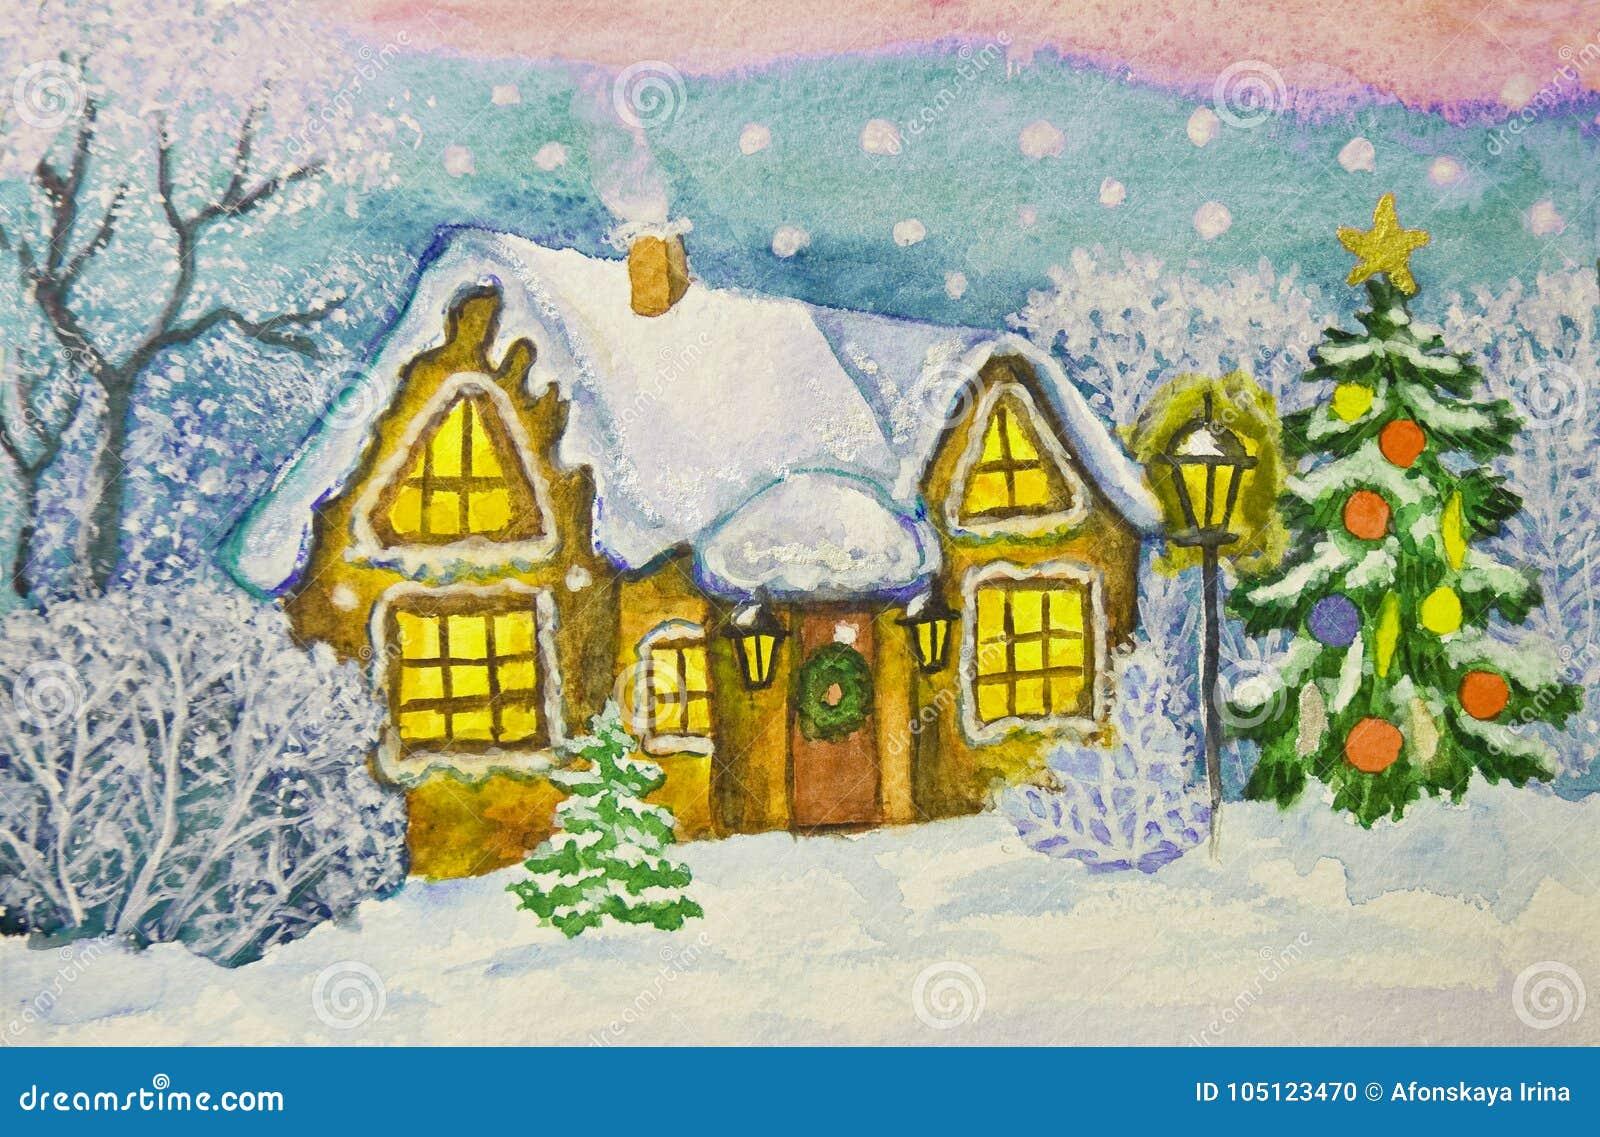 Christmas House Drawing.Christmas House Painting Stock Illustration Illustration